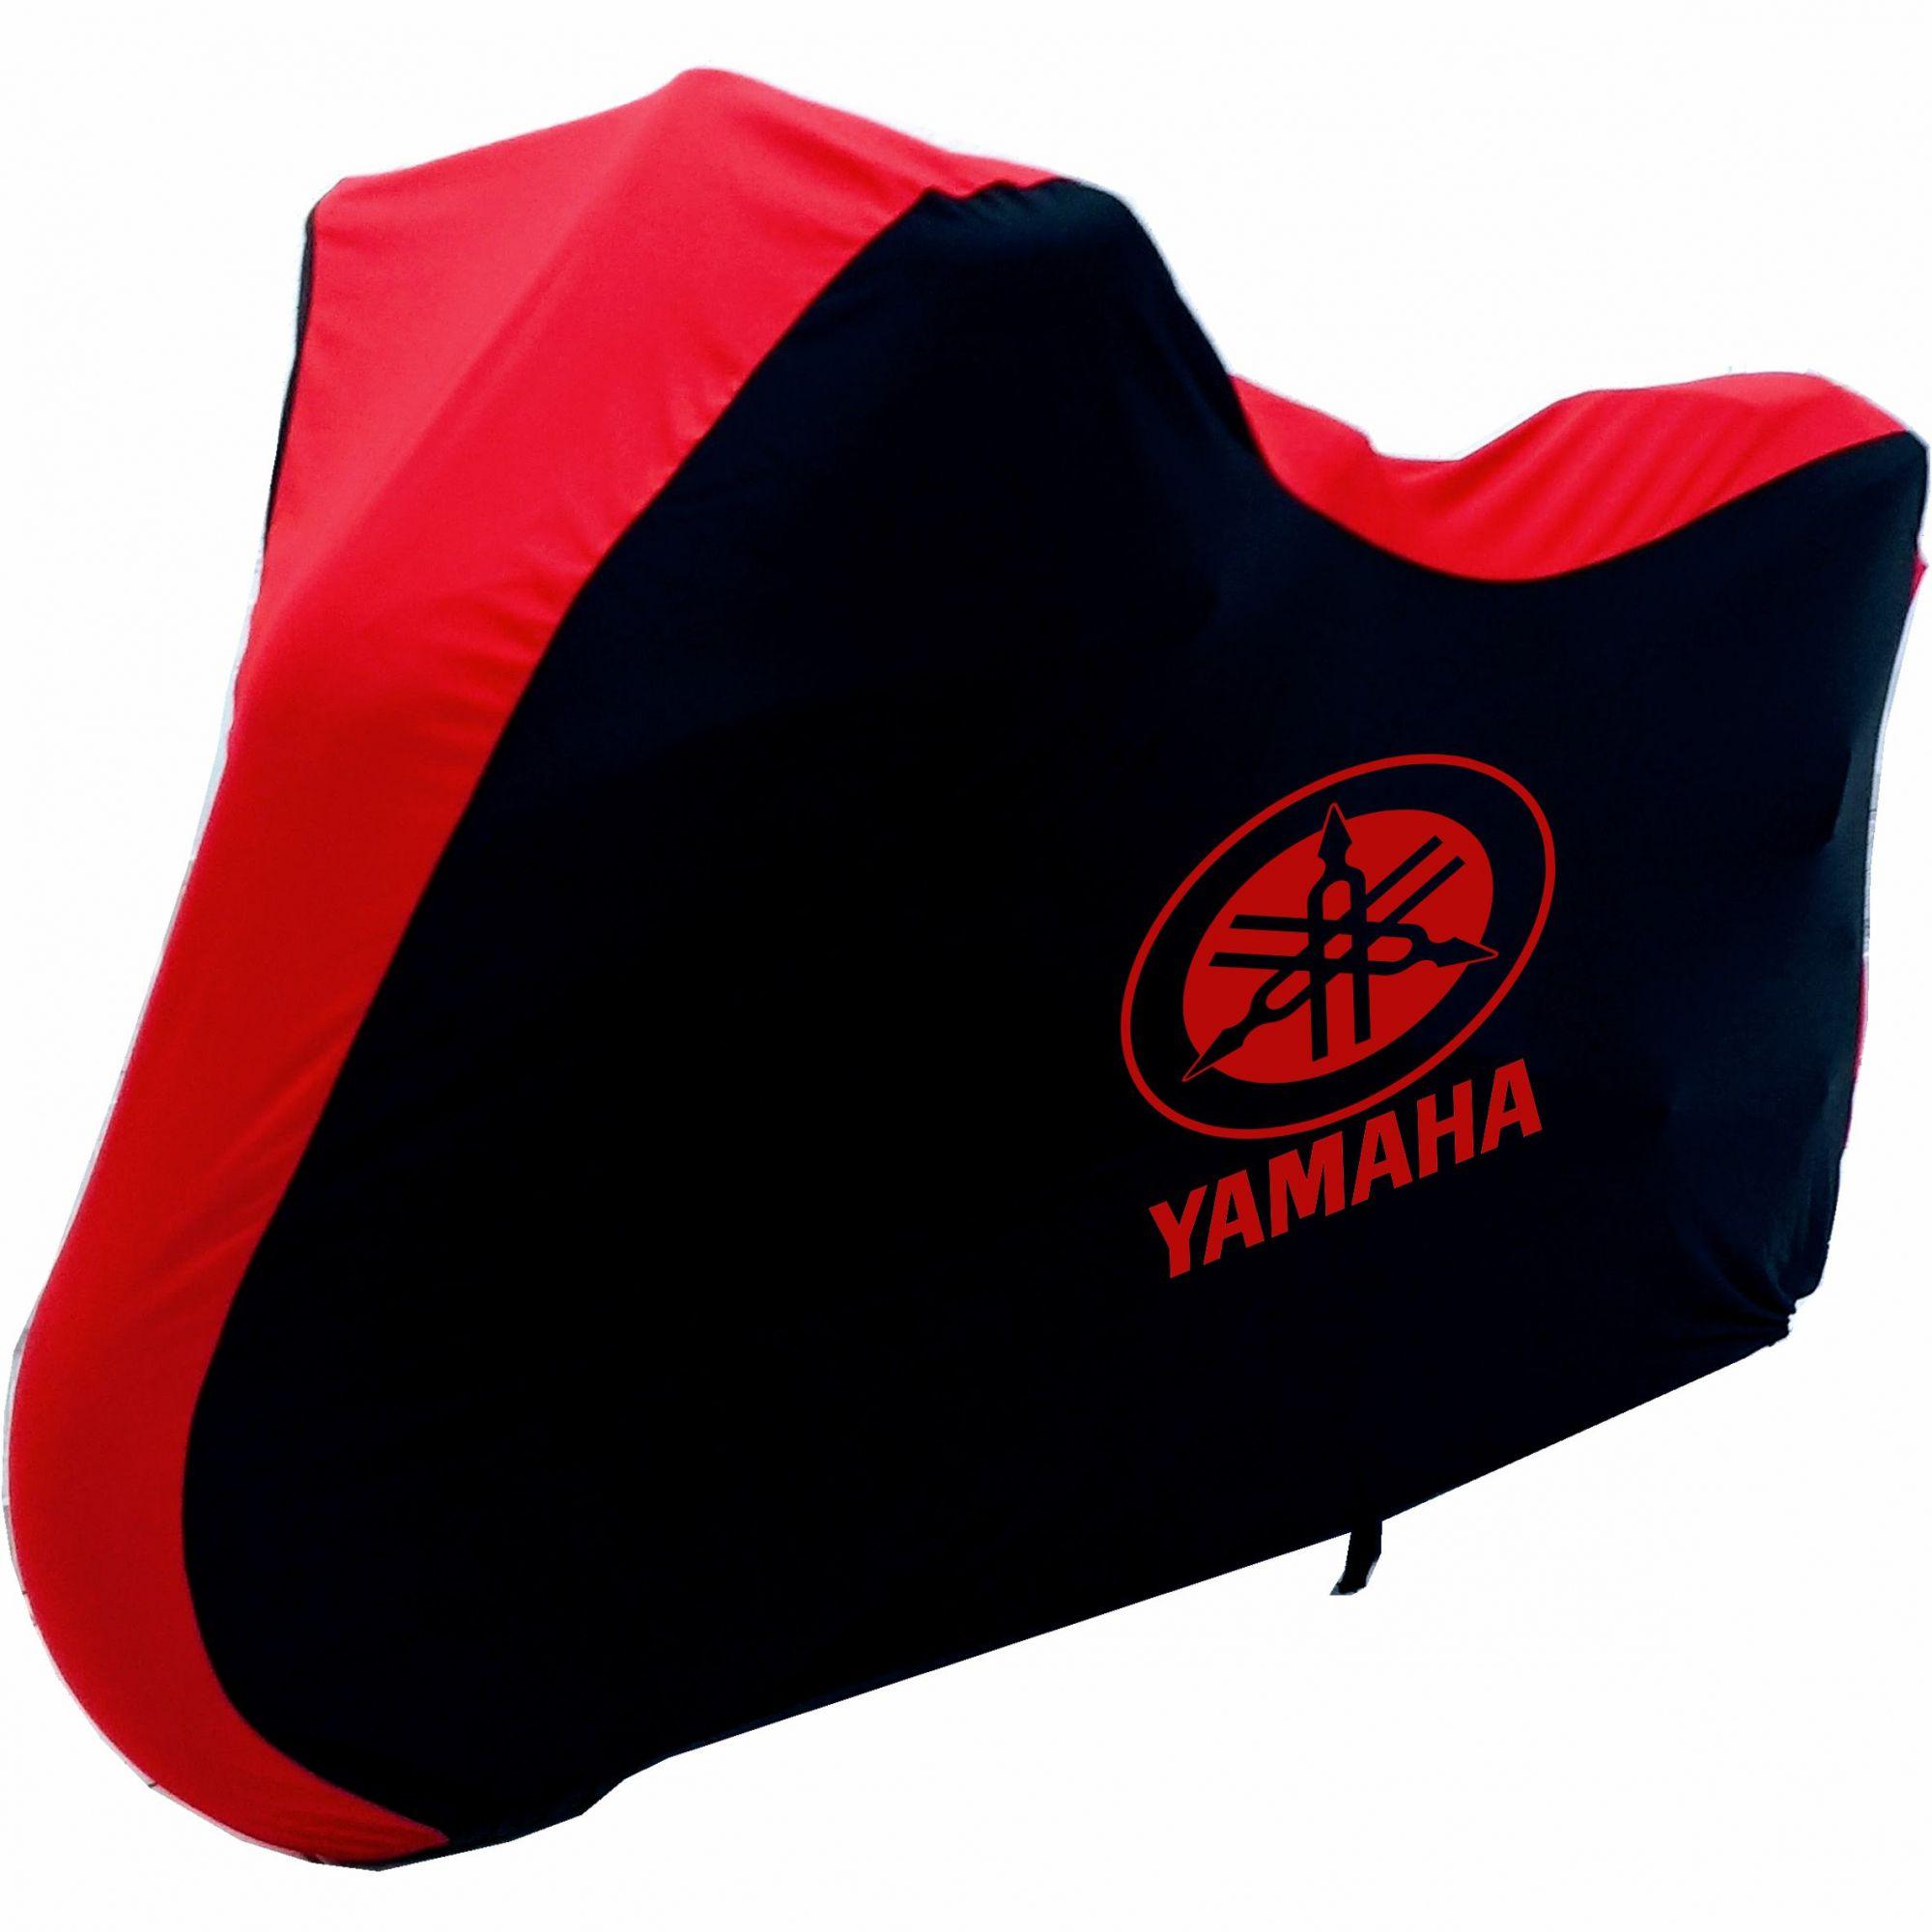 Capa Para Moto DualColor Yamaha Tam. M (permeavel)